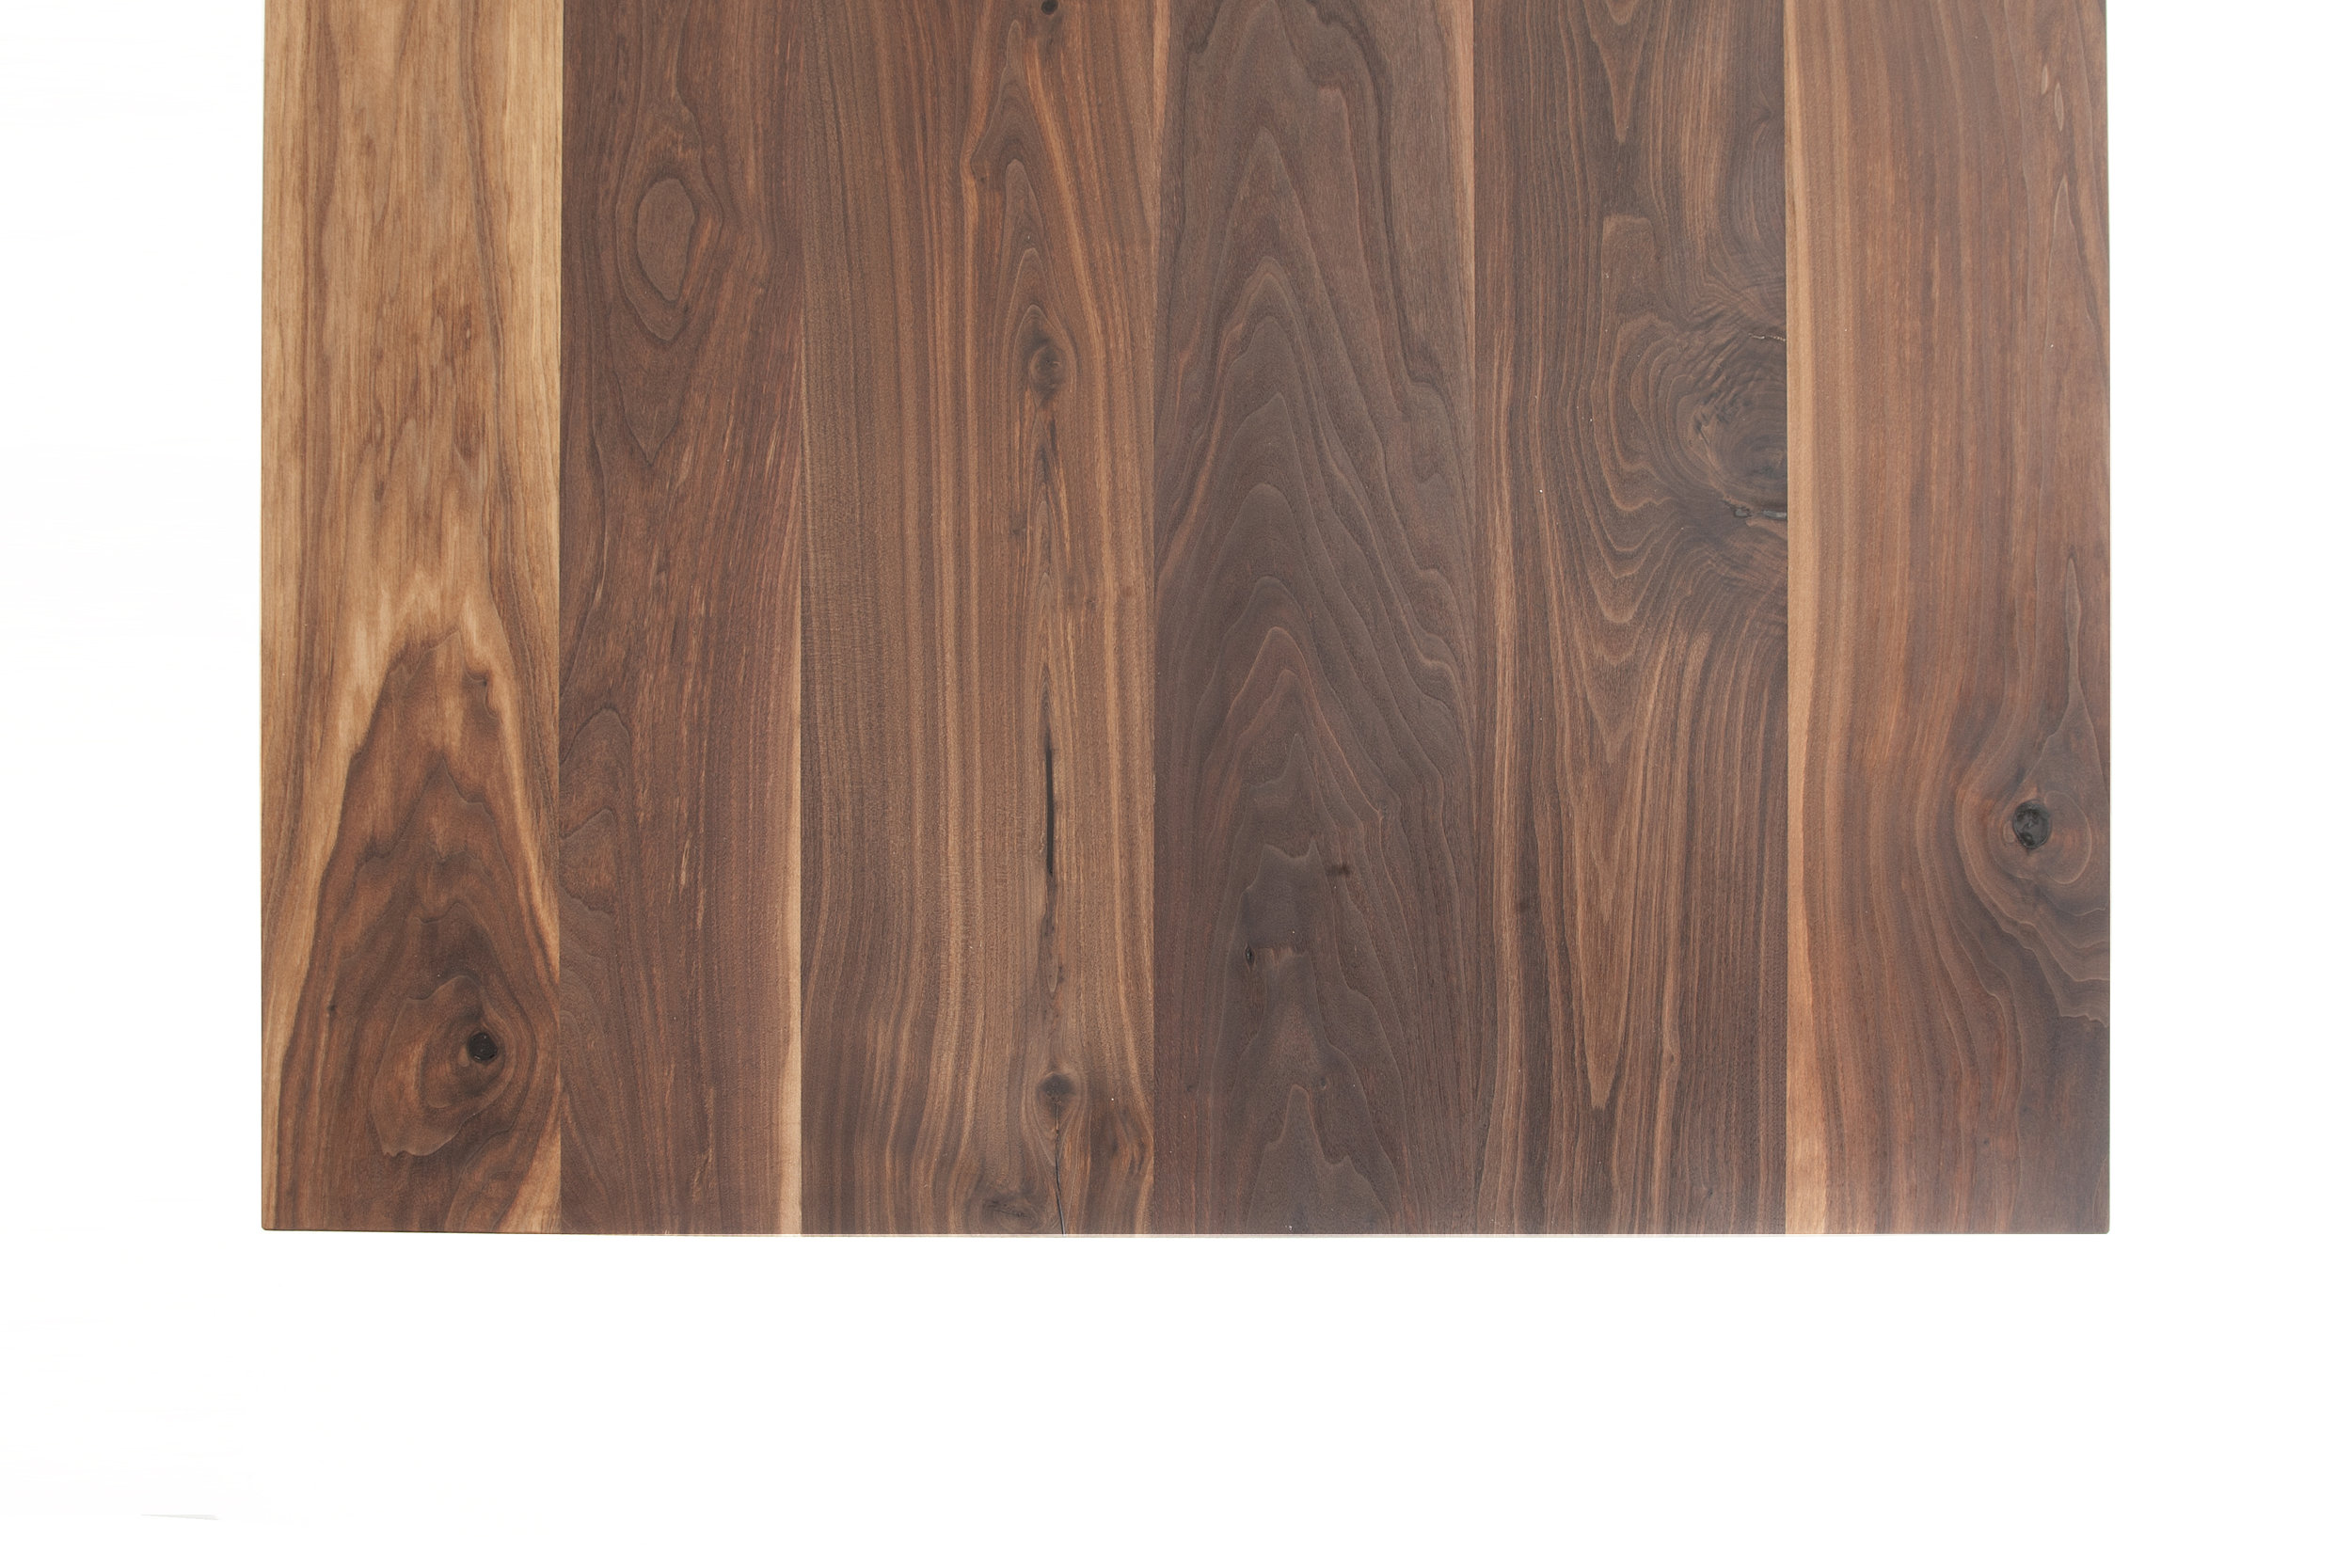 American black walnut top random width